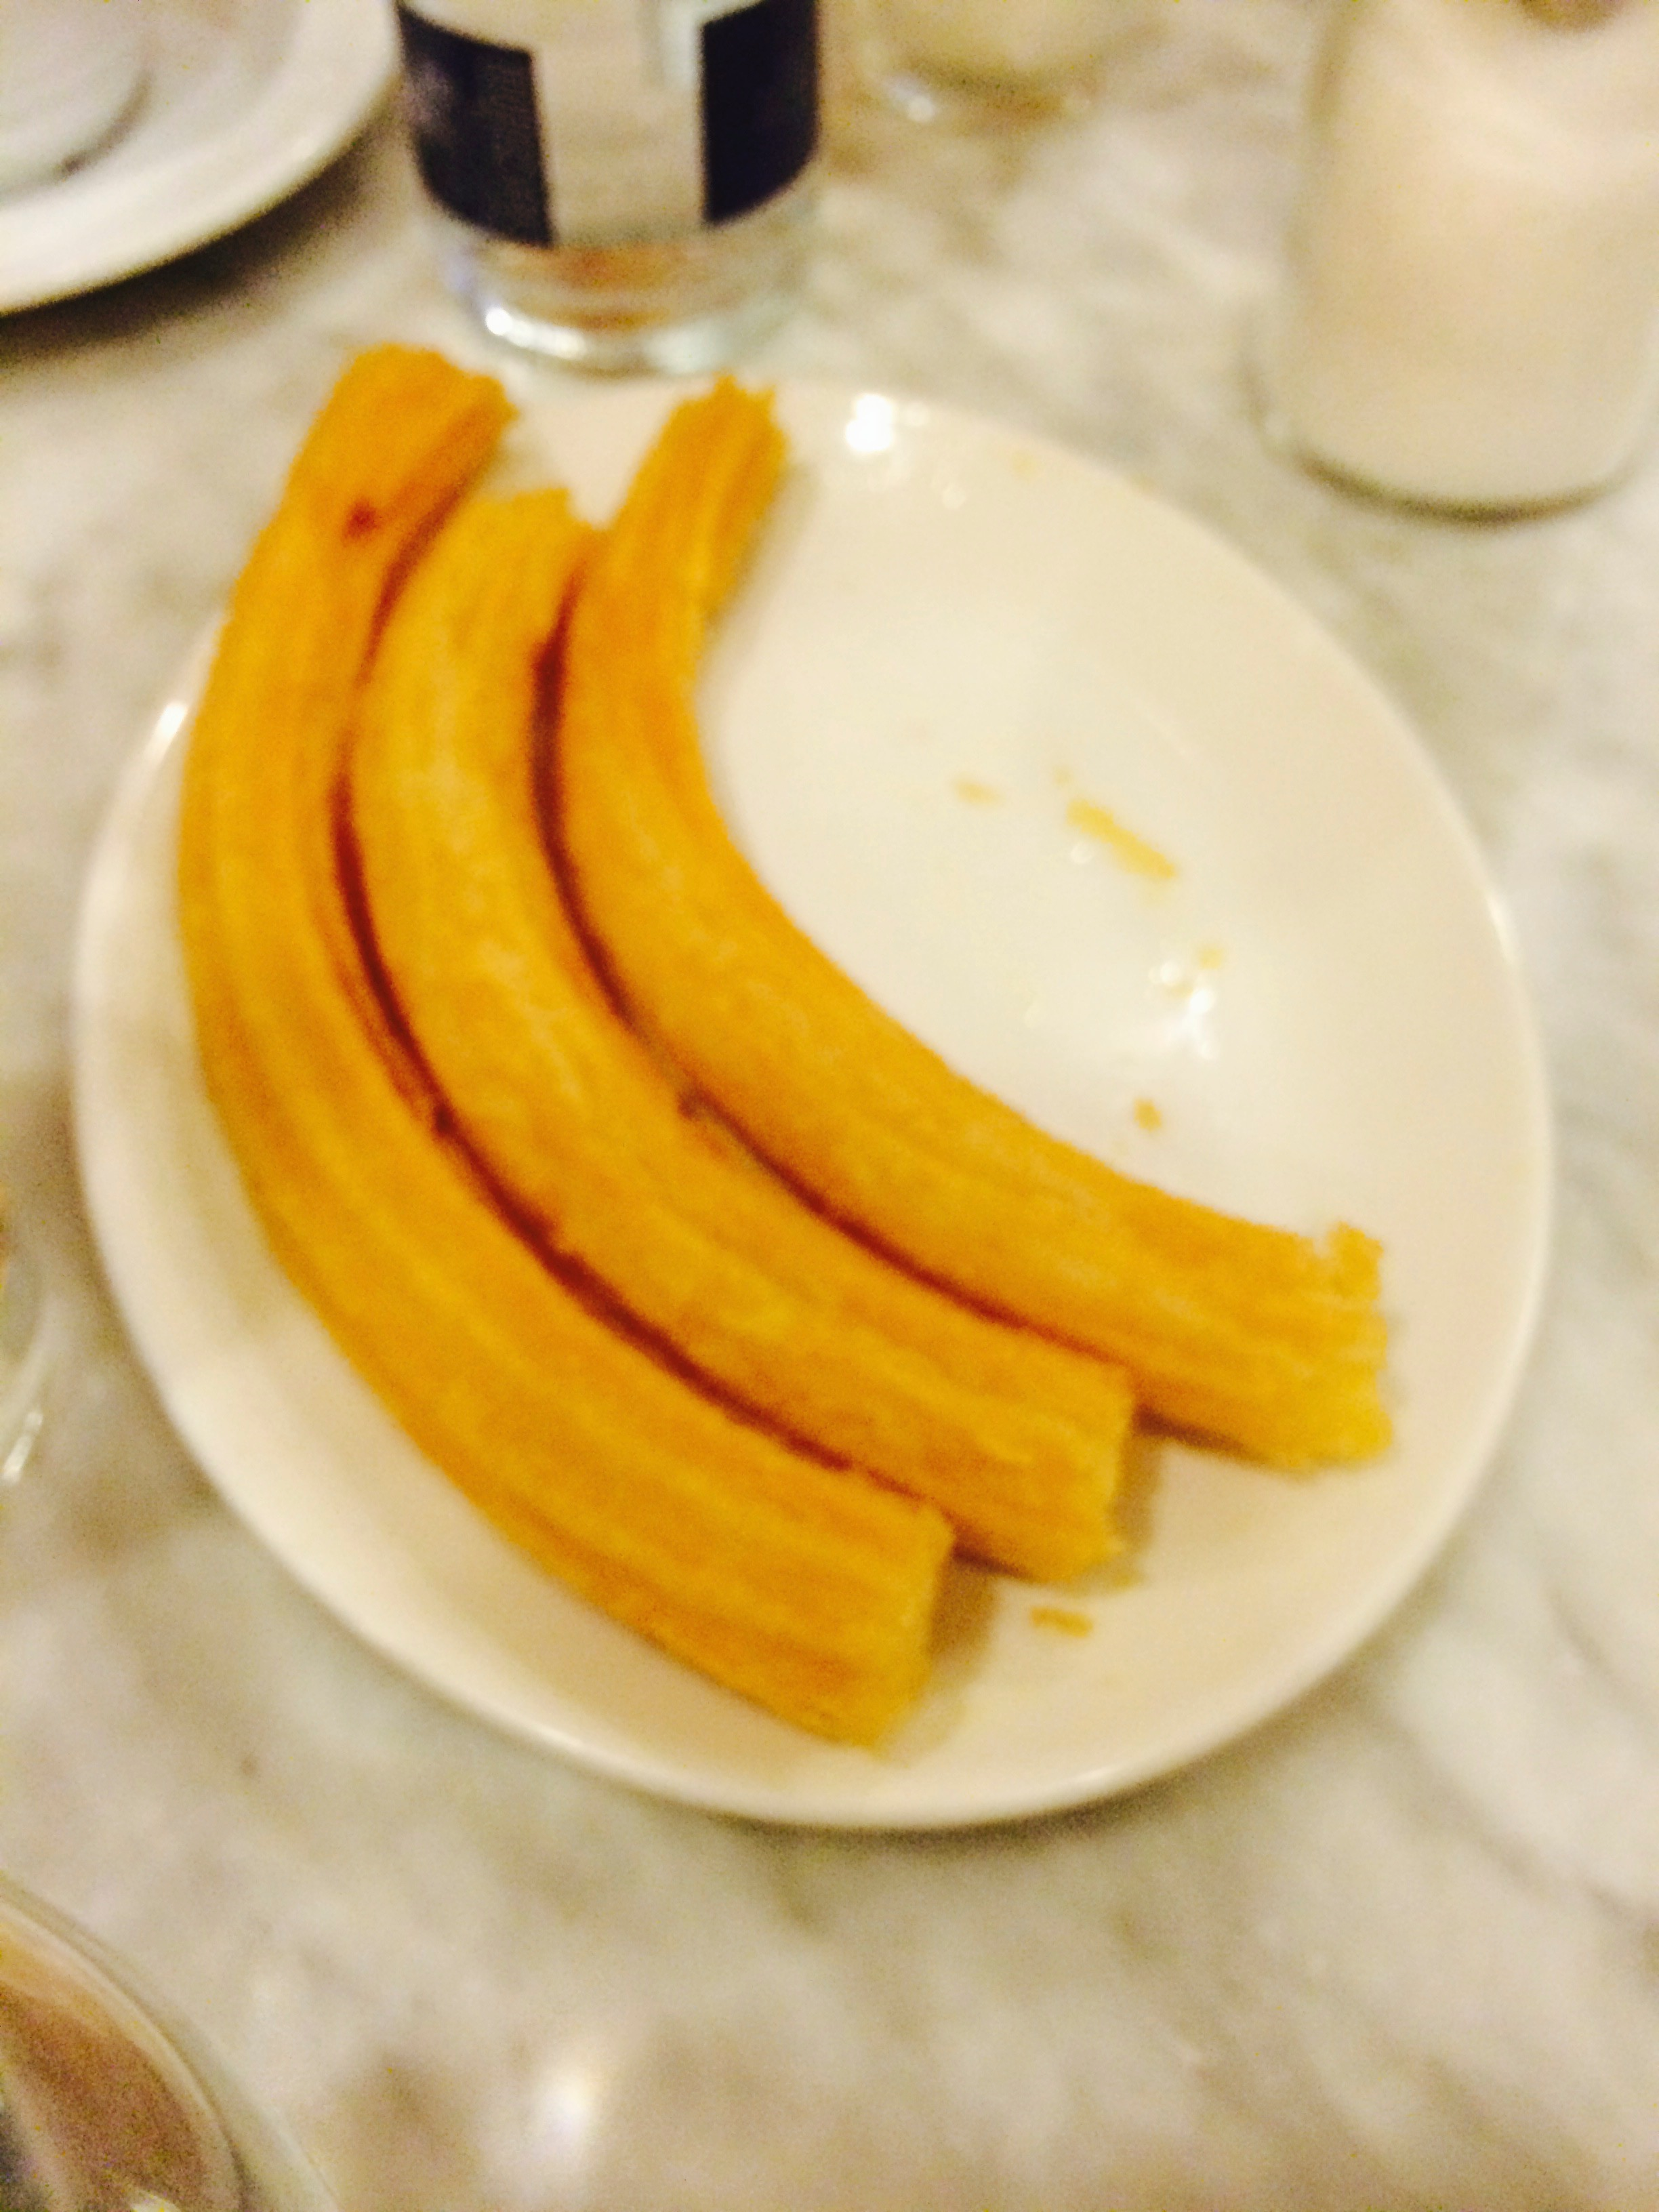 You need churros -